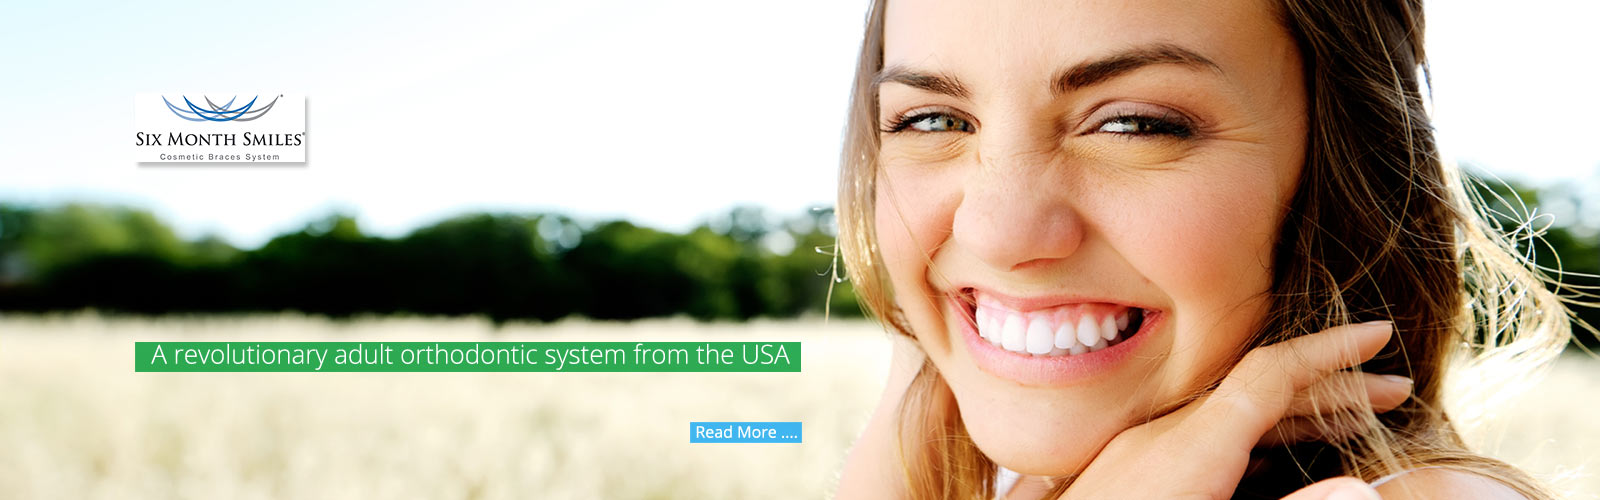 crossgar-dental-practice-six-month-smiles-1600×500-v15